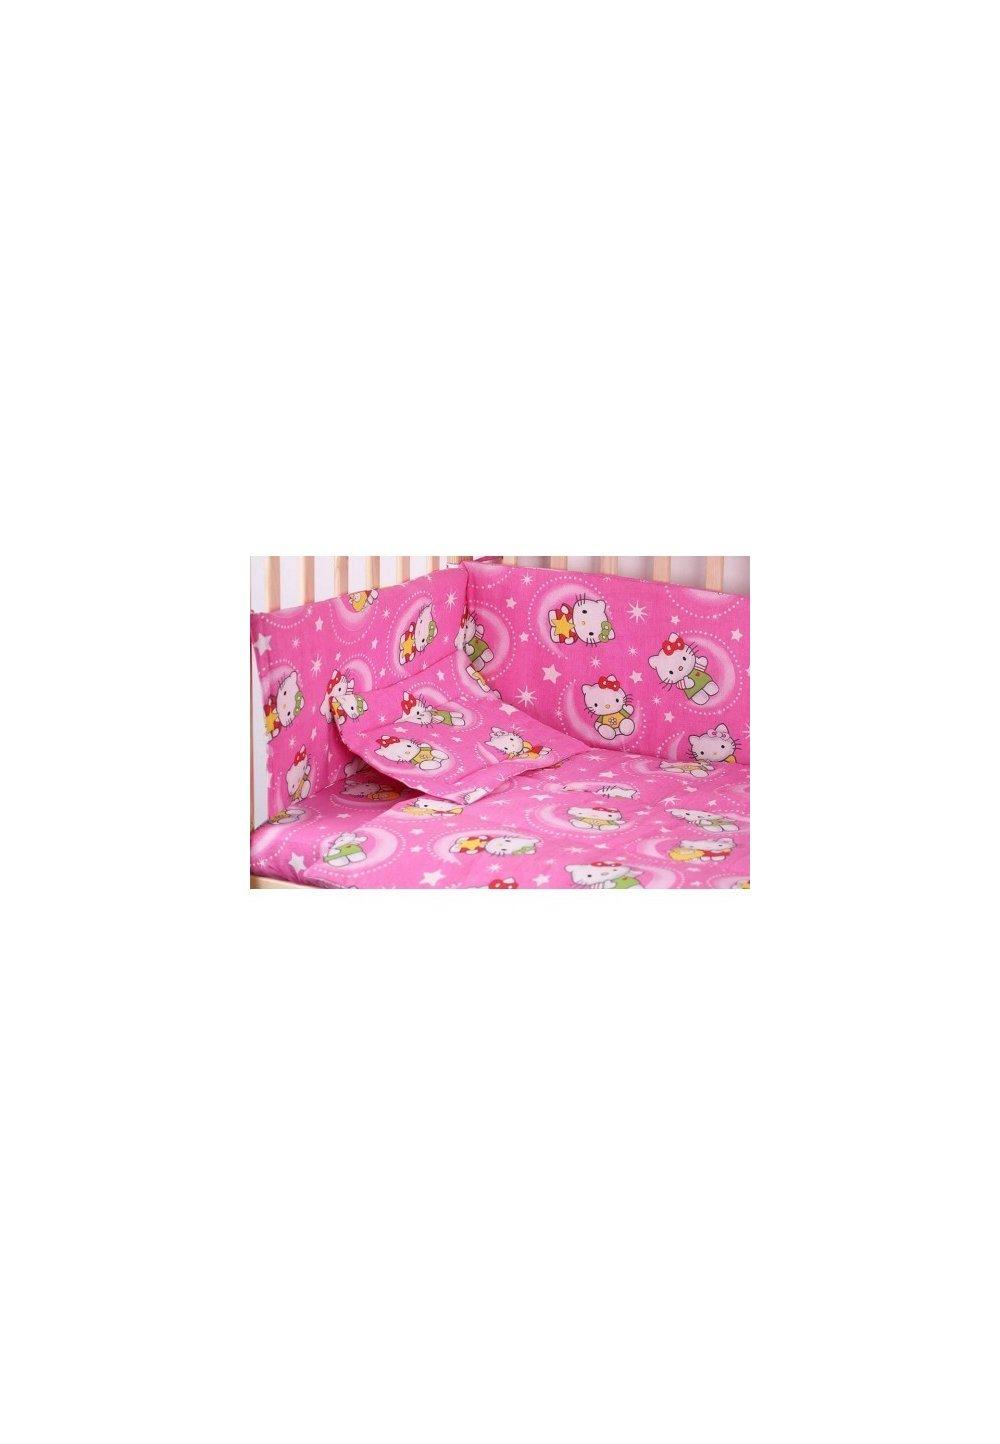 Lenjerie patut bumbac, Hello Kitty, roz, 5 piese 140x70cm imagine